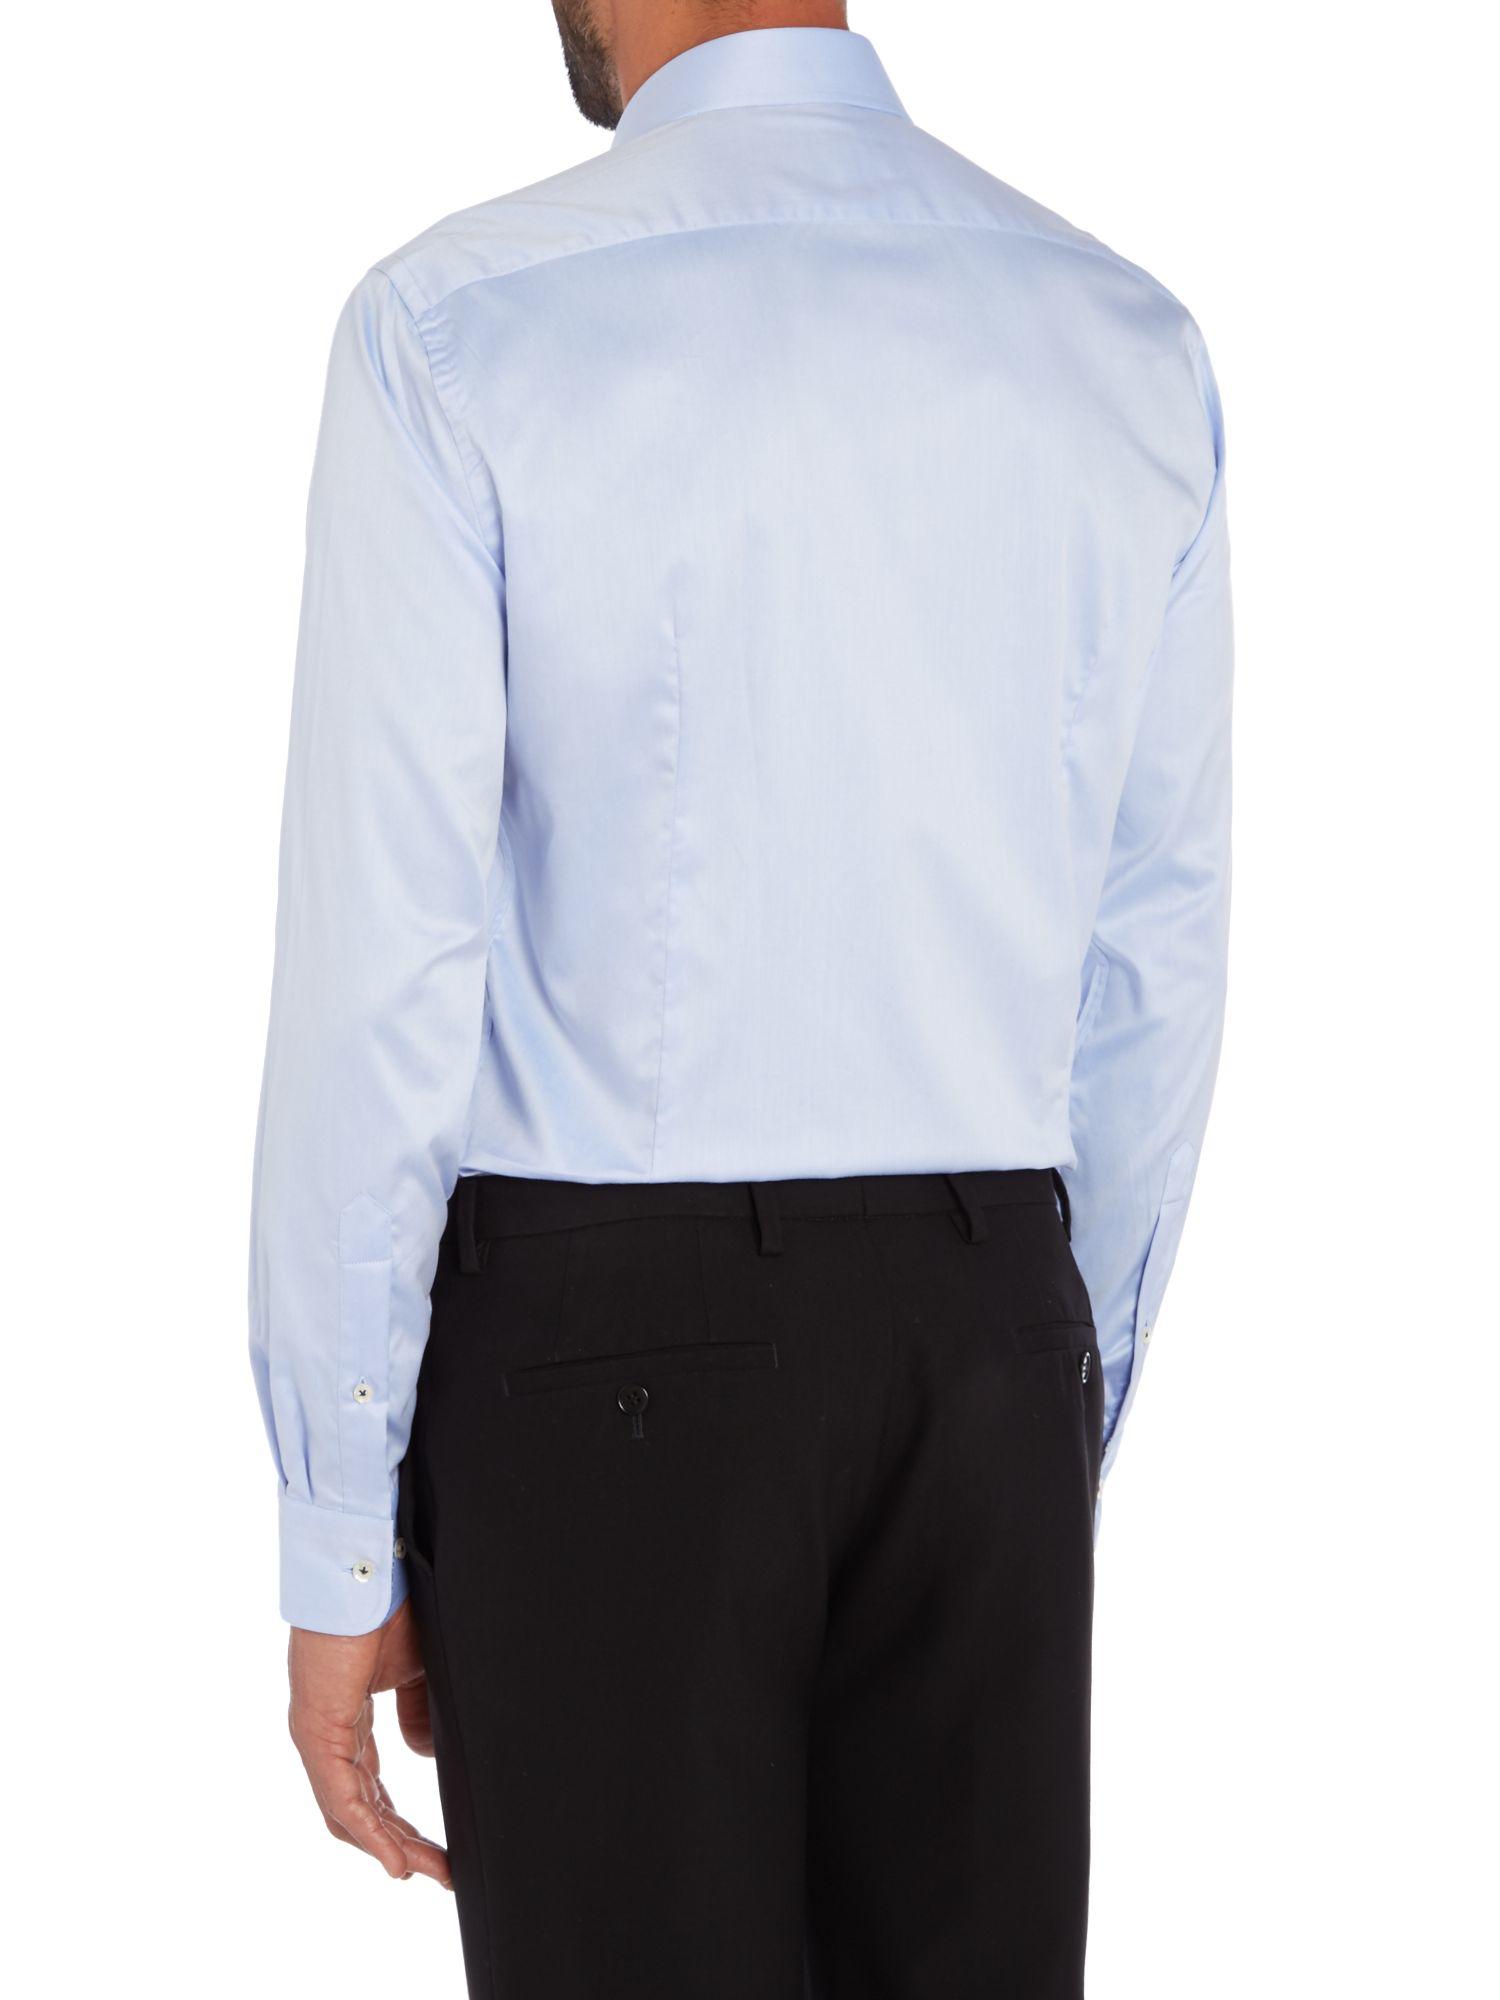 B umler tailored blue twill single cuff shirt in blue for for Single cuff dress shirt